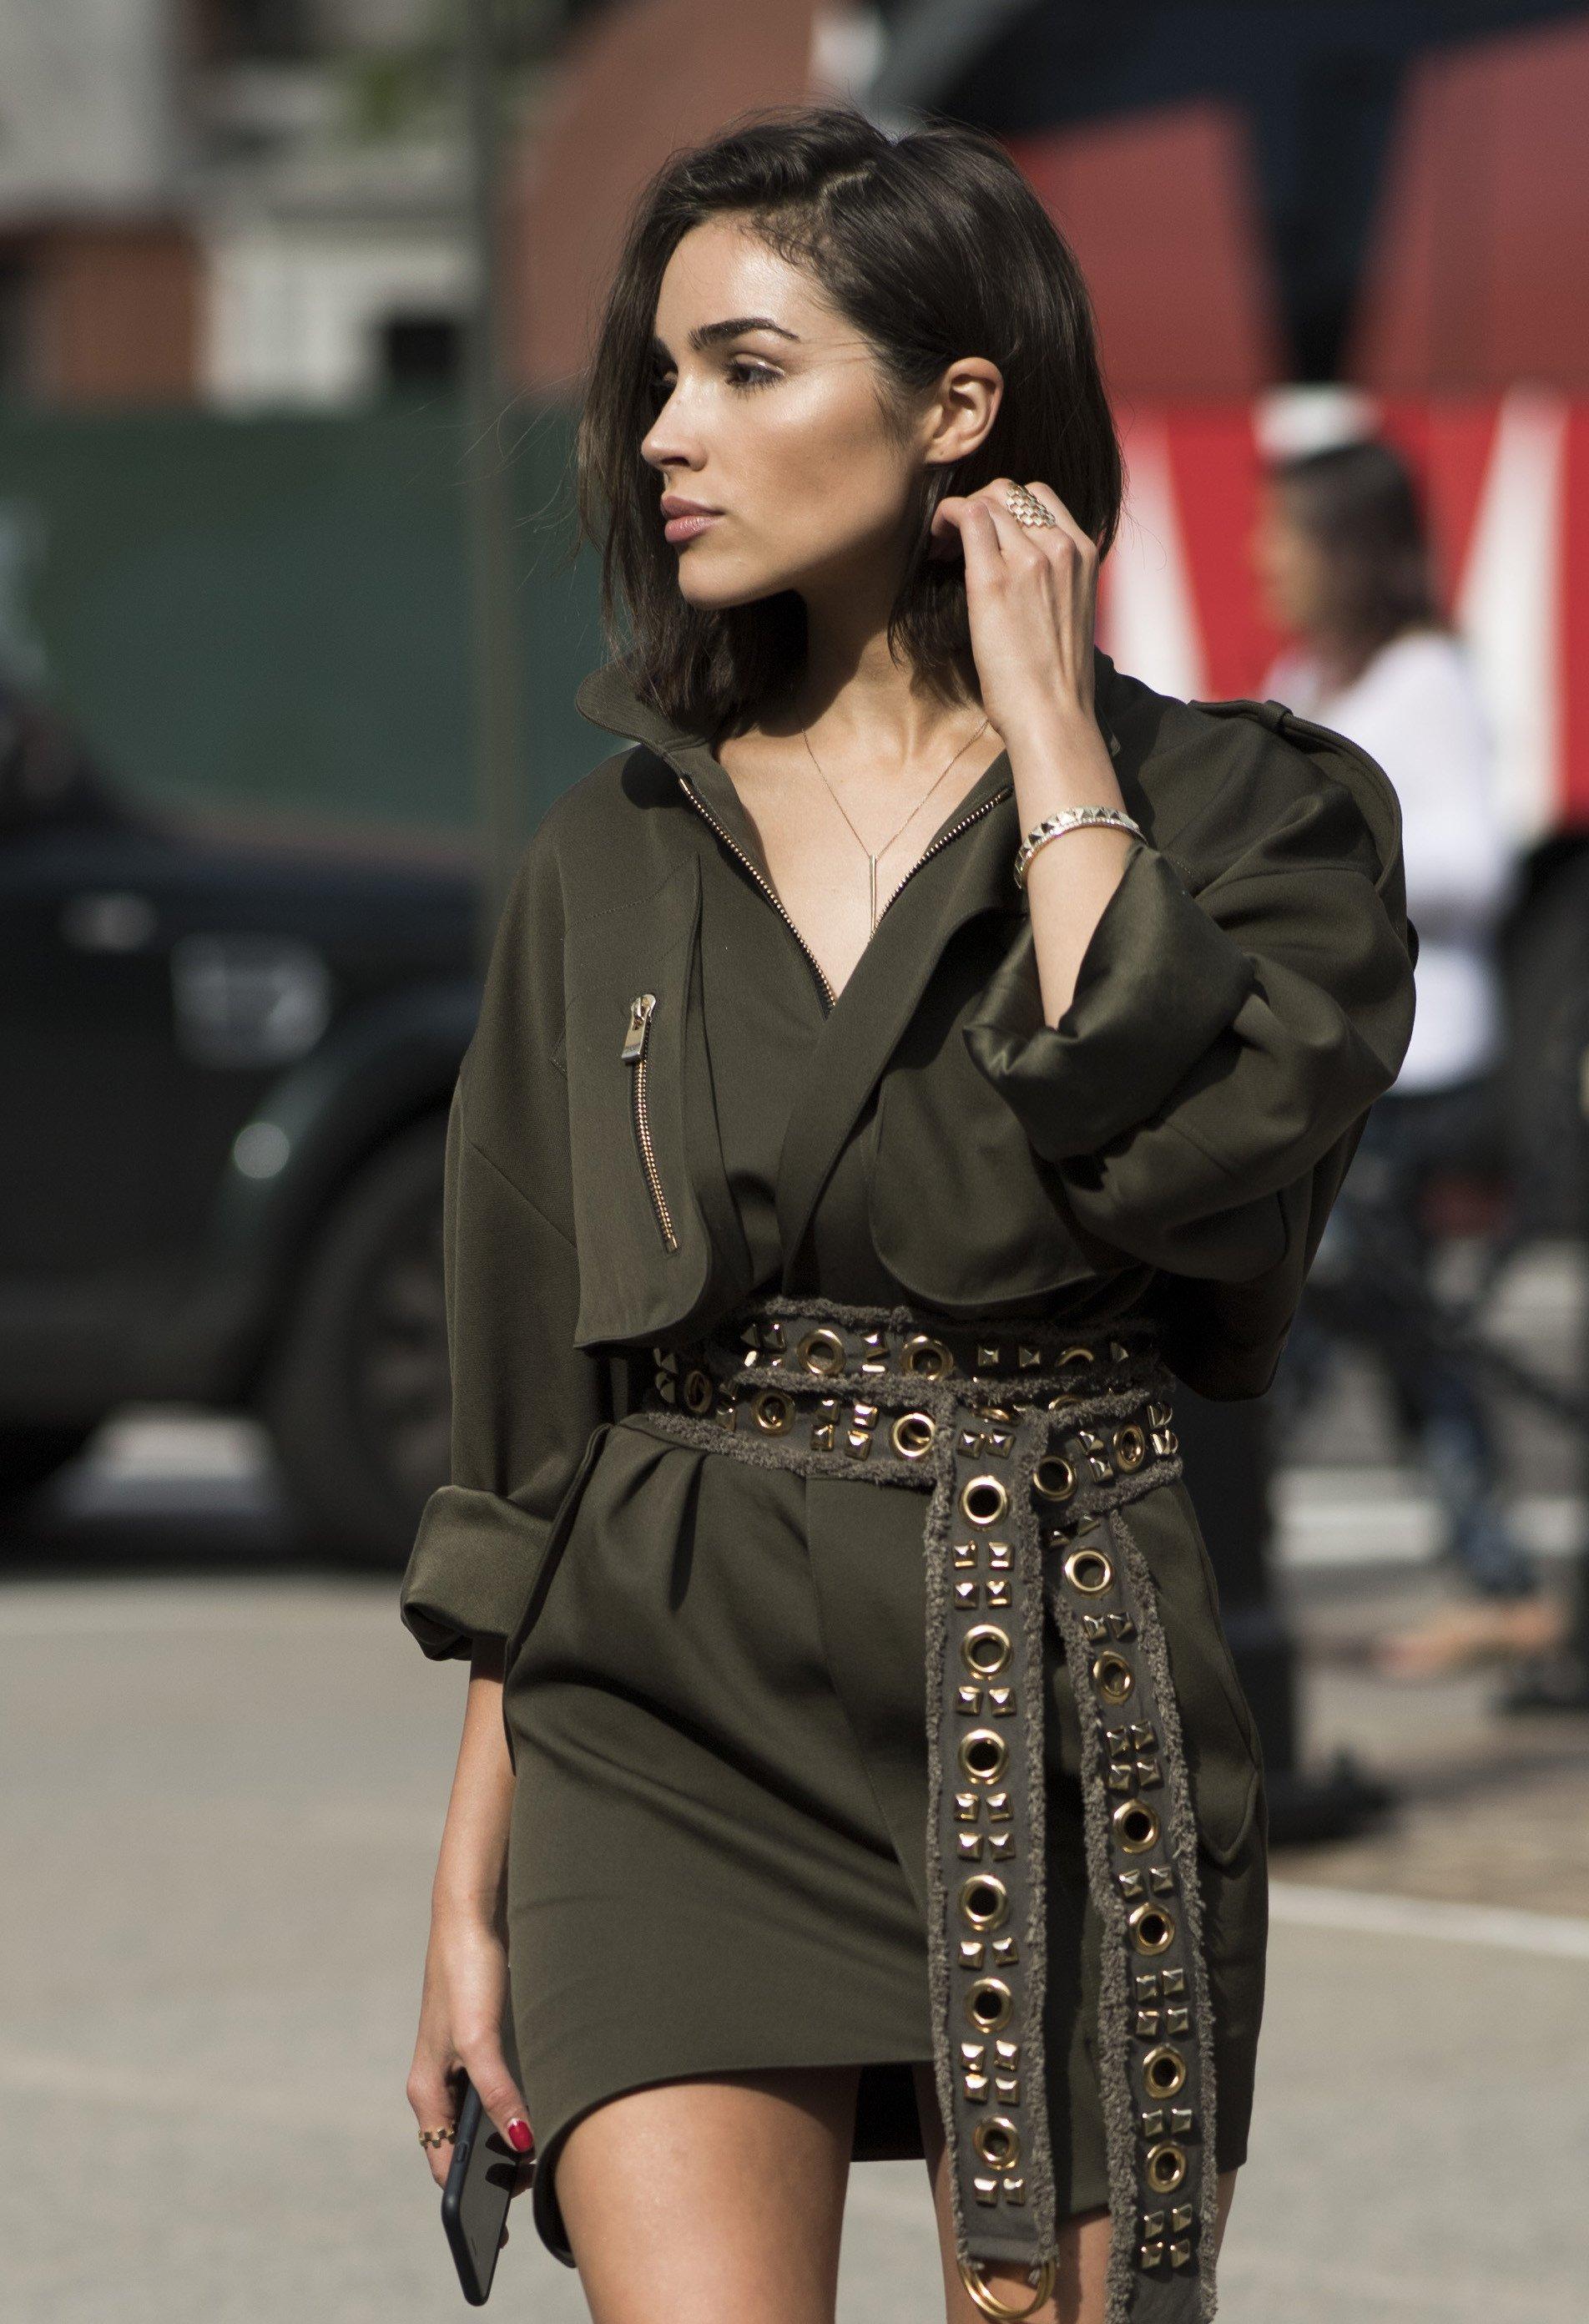 Established+Jewelry+Press,+Celebrity+Olivia+Culpo.jpeg